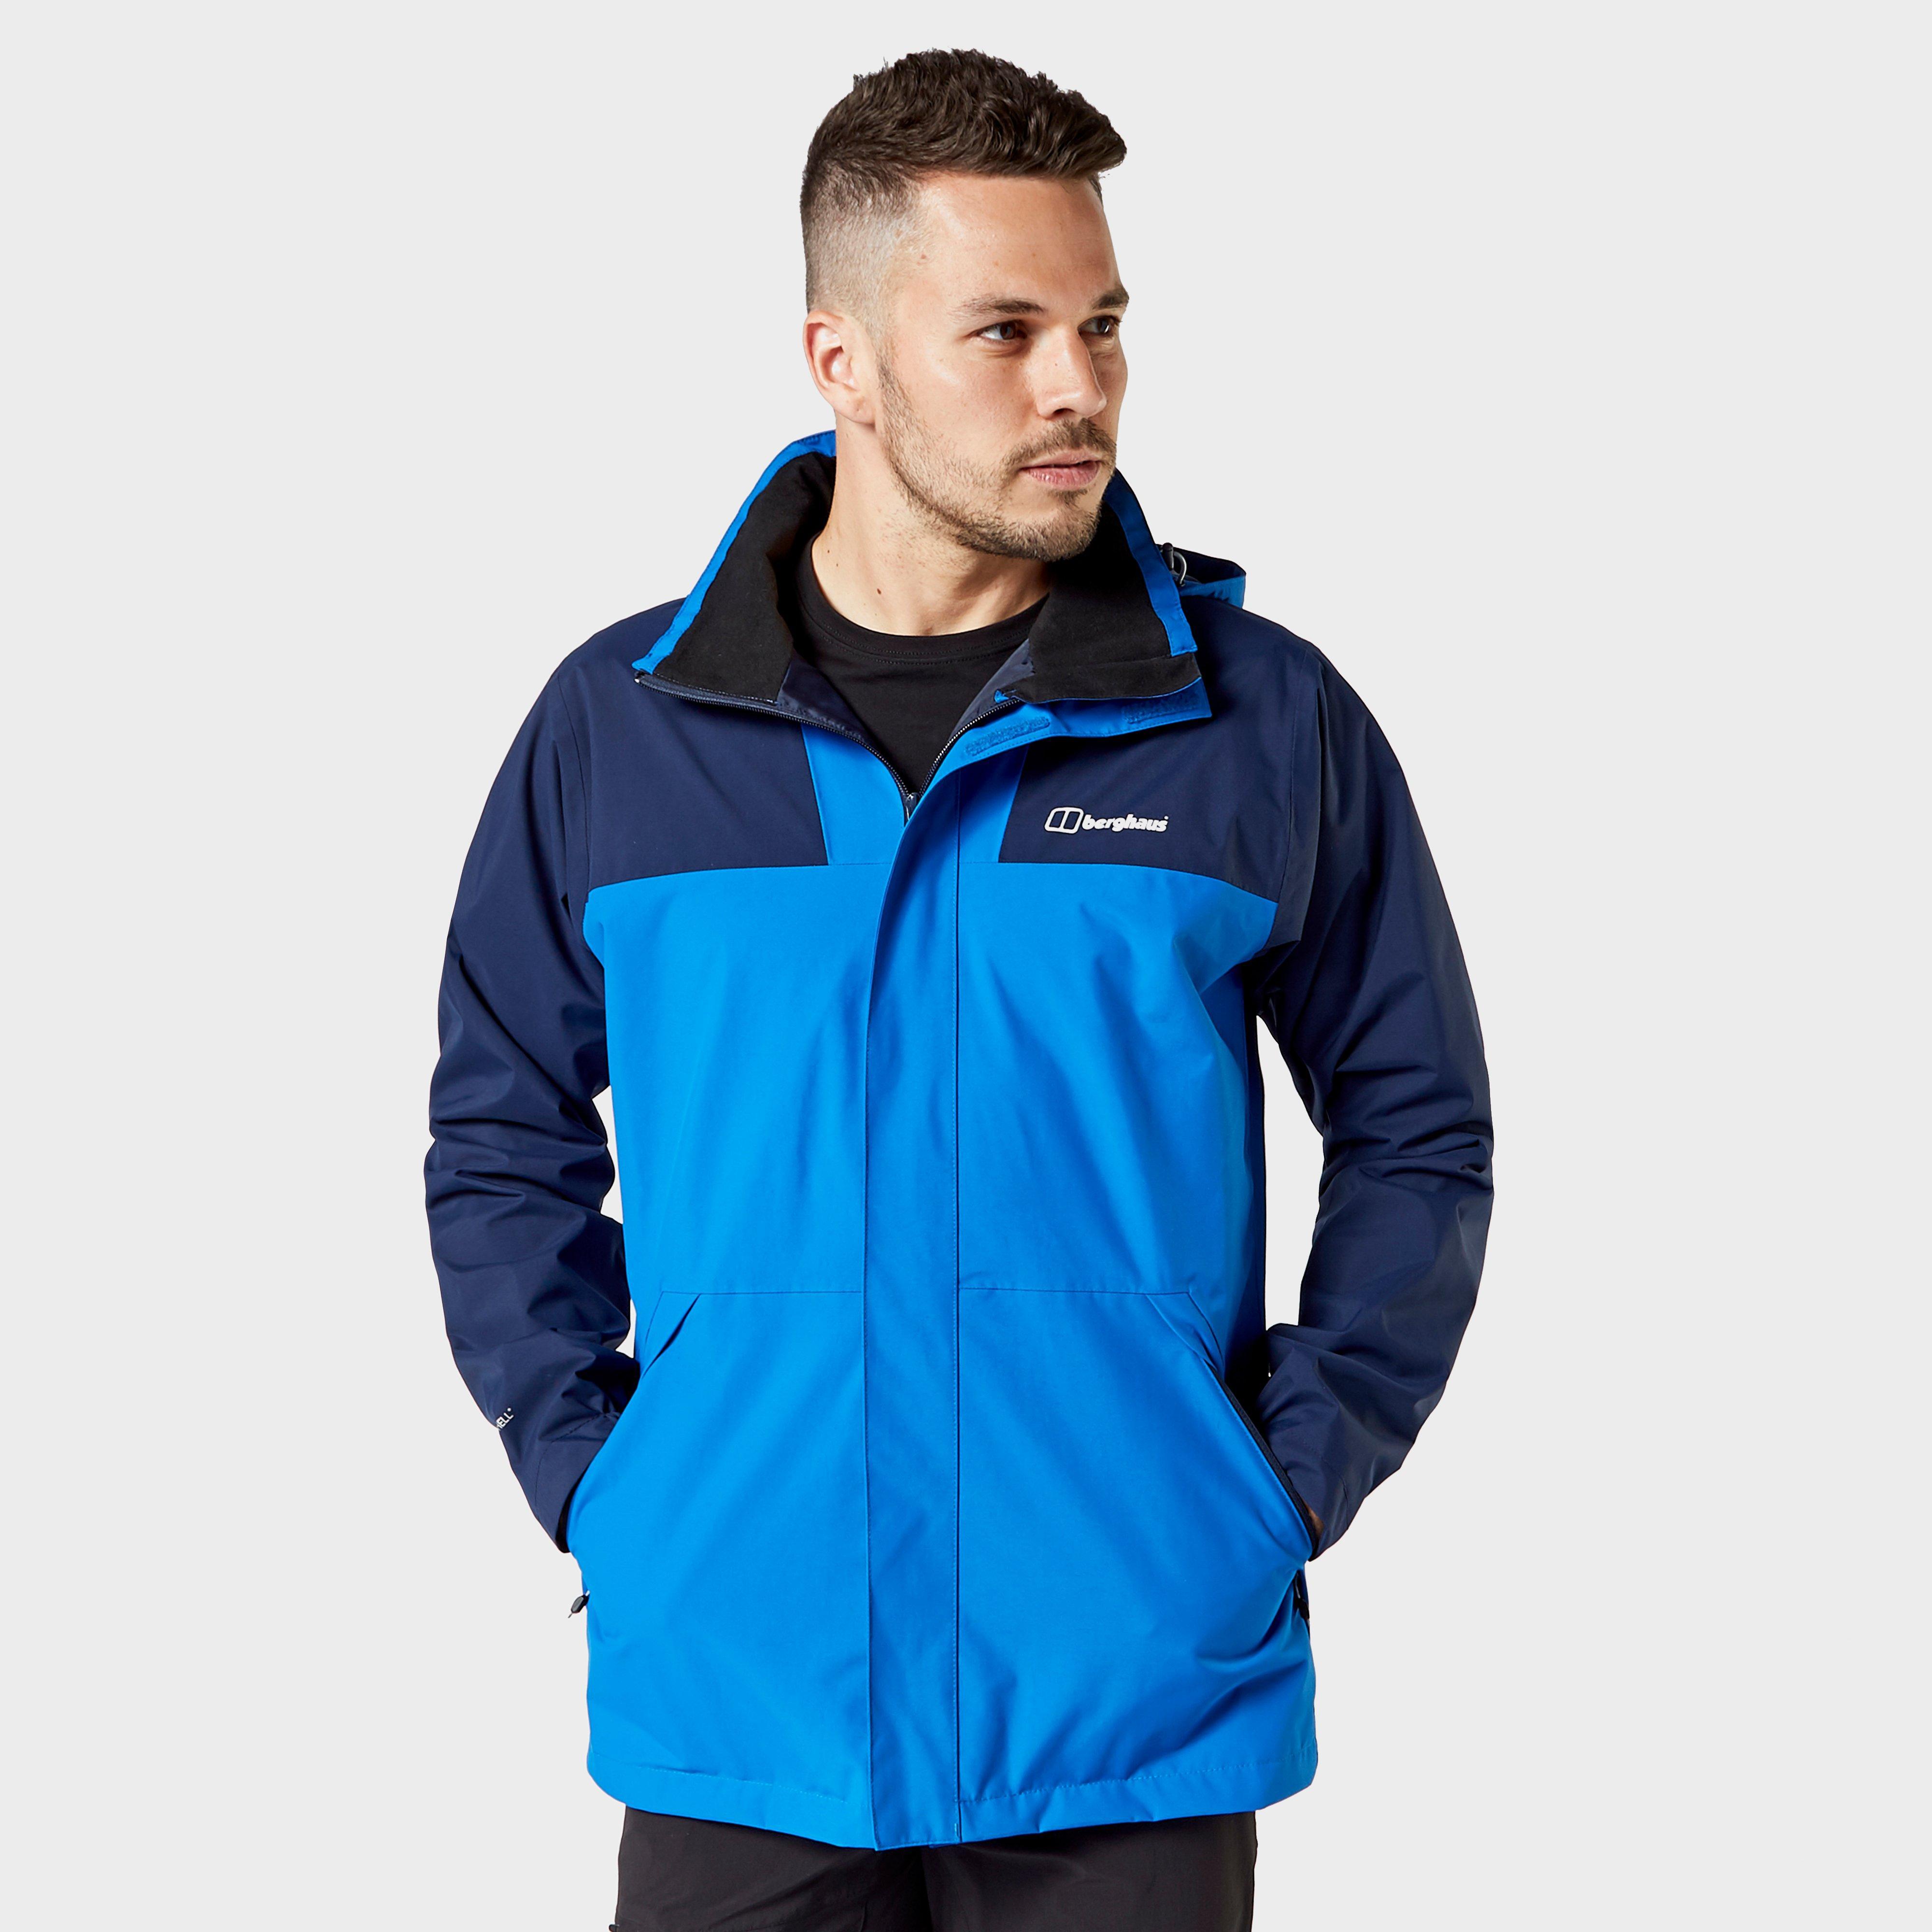 Berghaus Mens Kinglas Pro Jacket - Blue/blu$  Blue/blu$